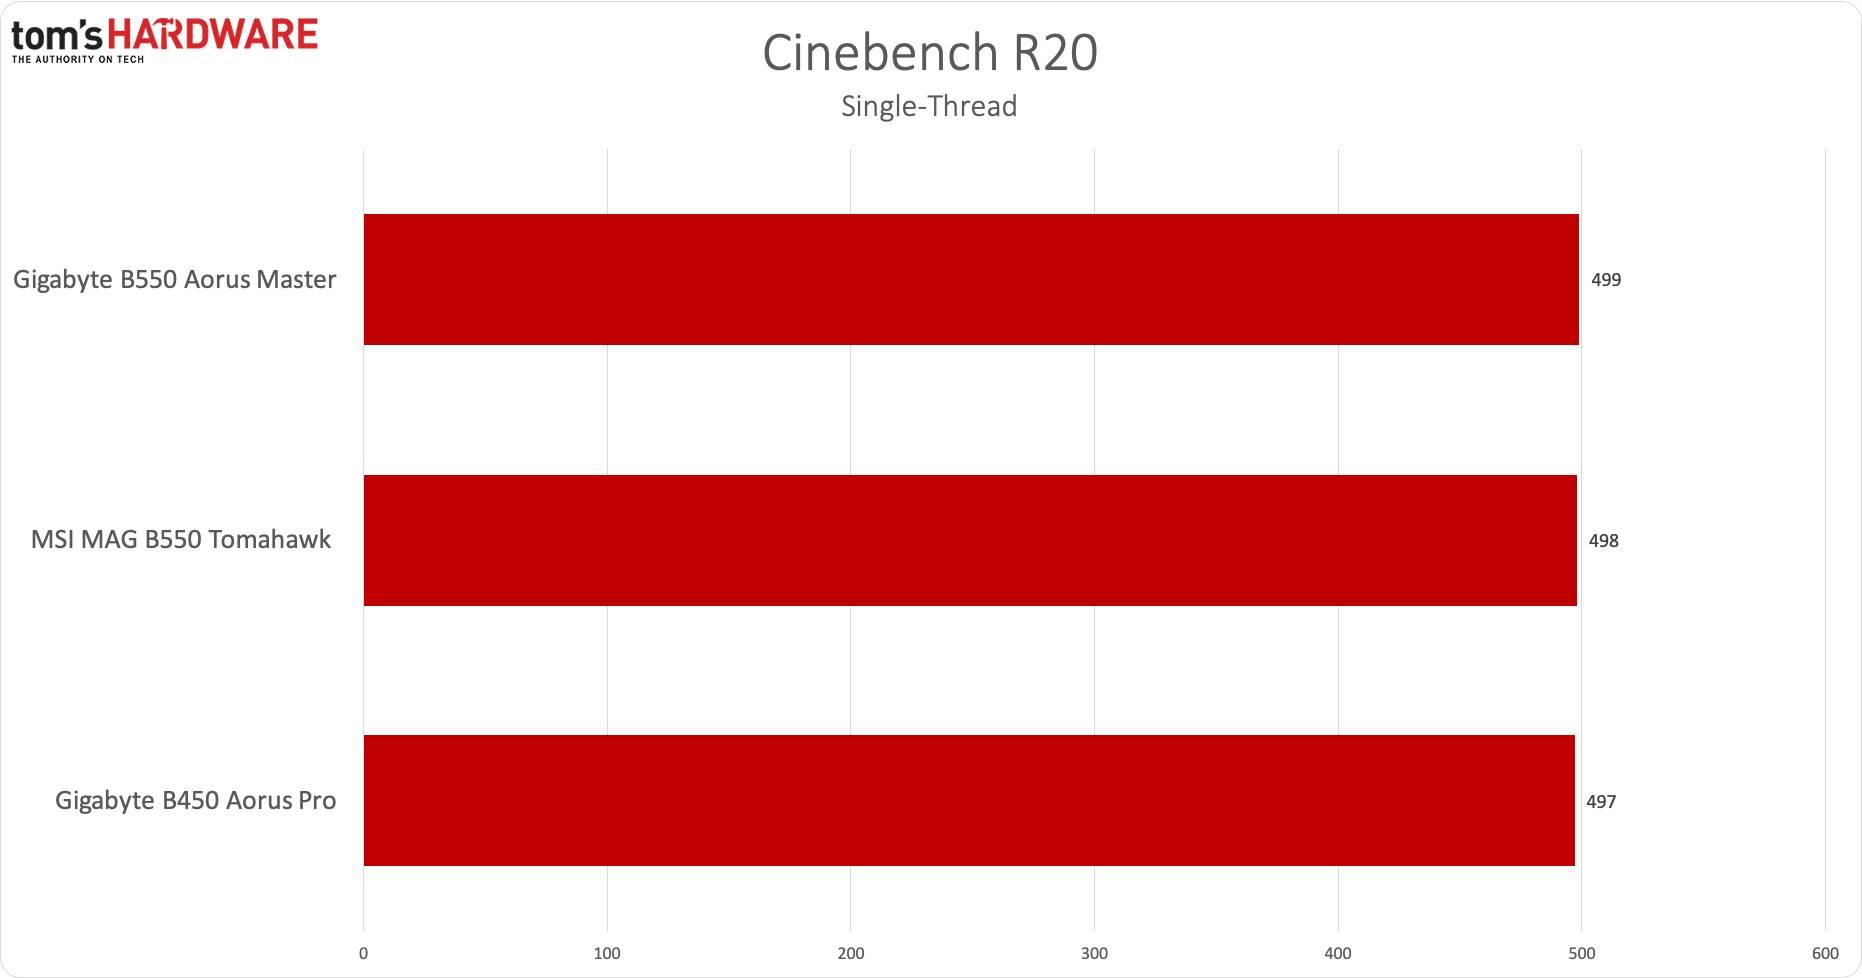 AMD B550 - CBR20 single